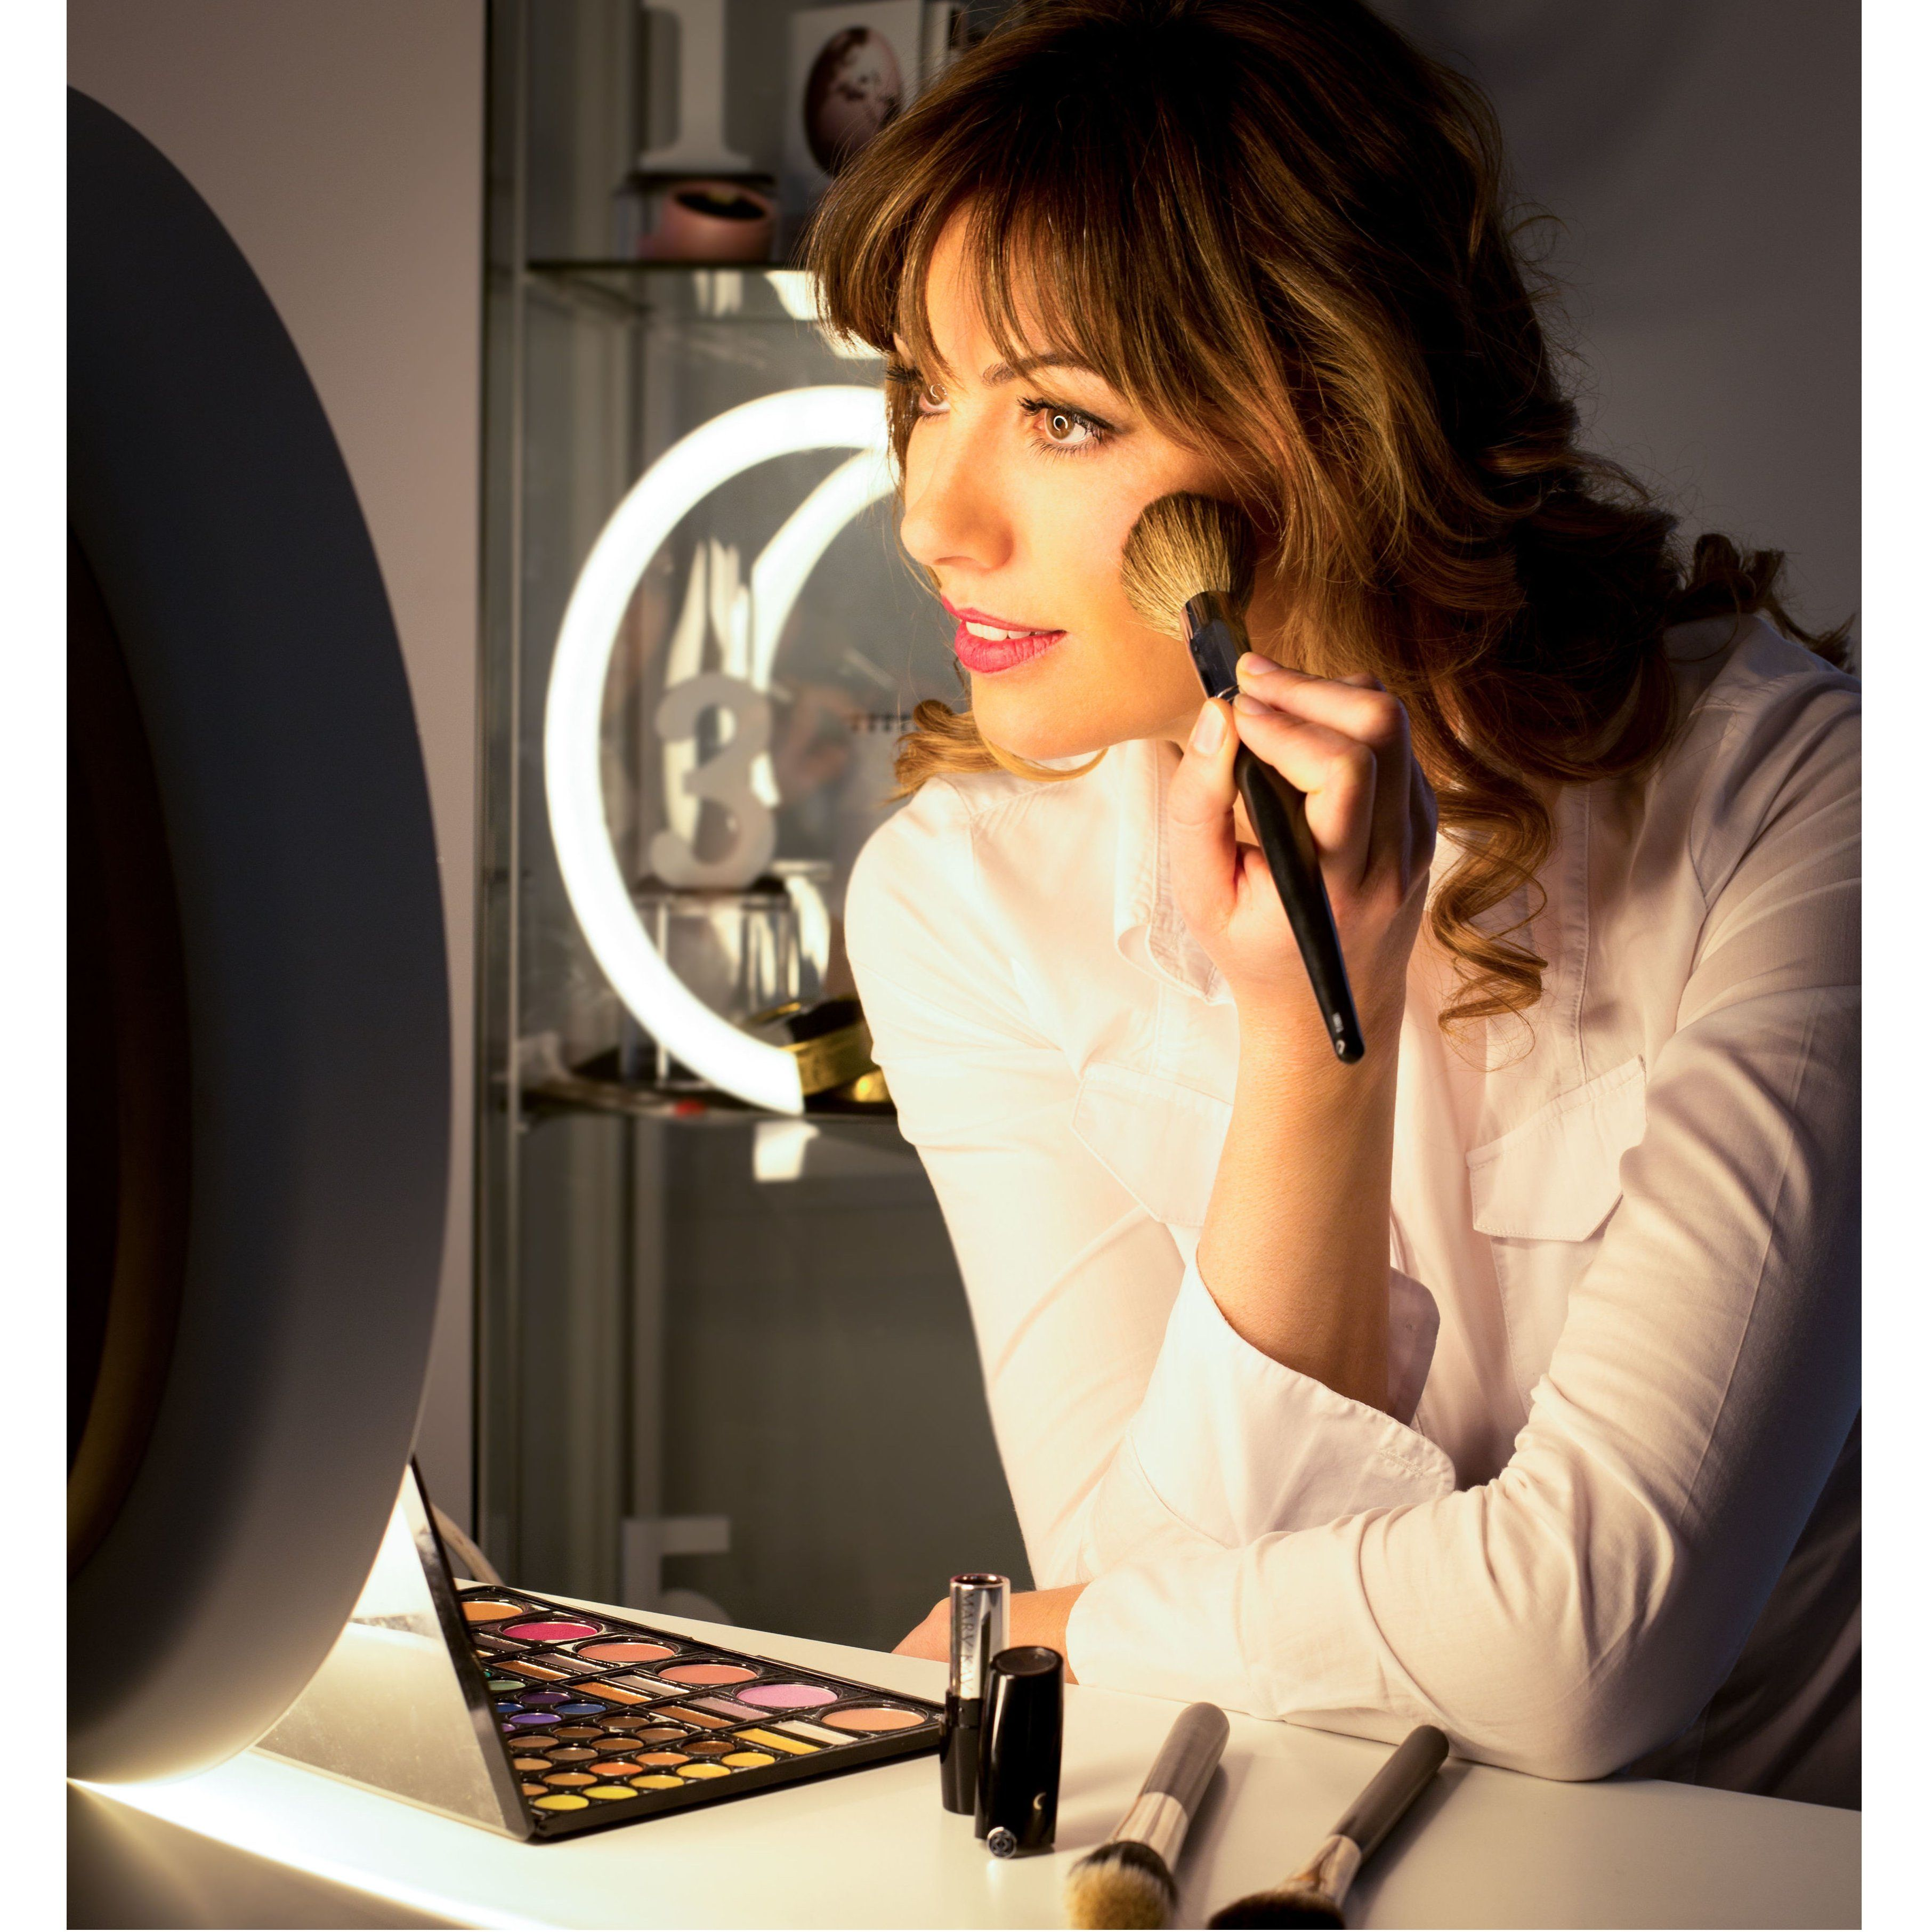 Curso de Automaquillaje: Servicios de Tht maquilladora